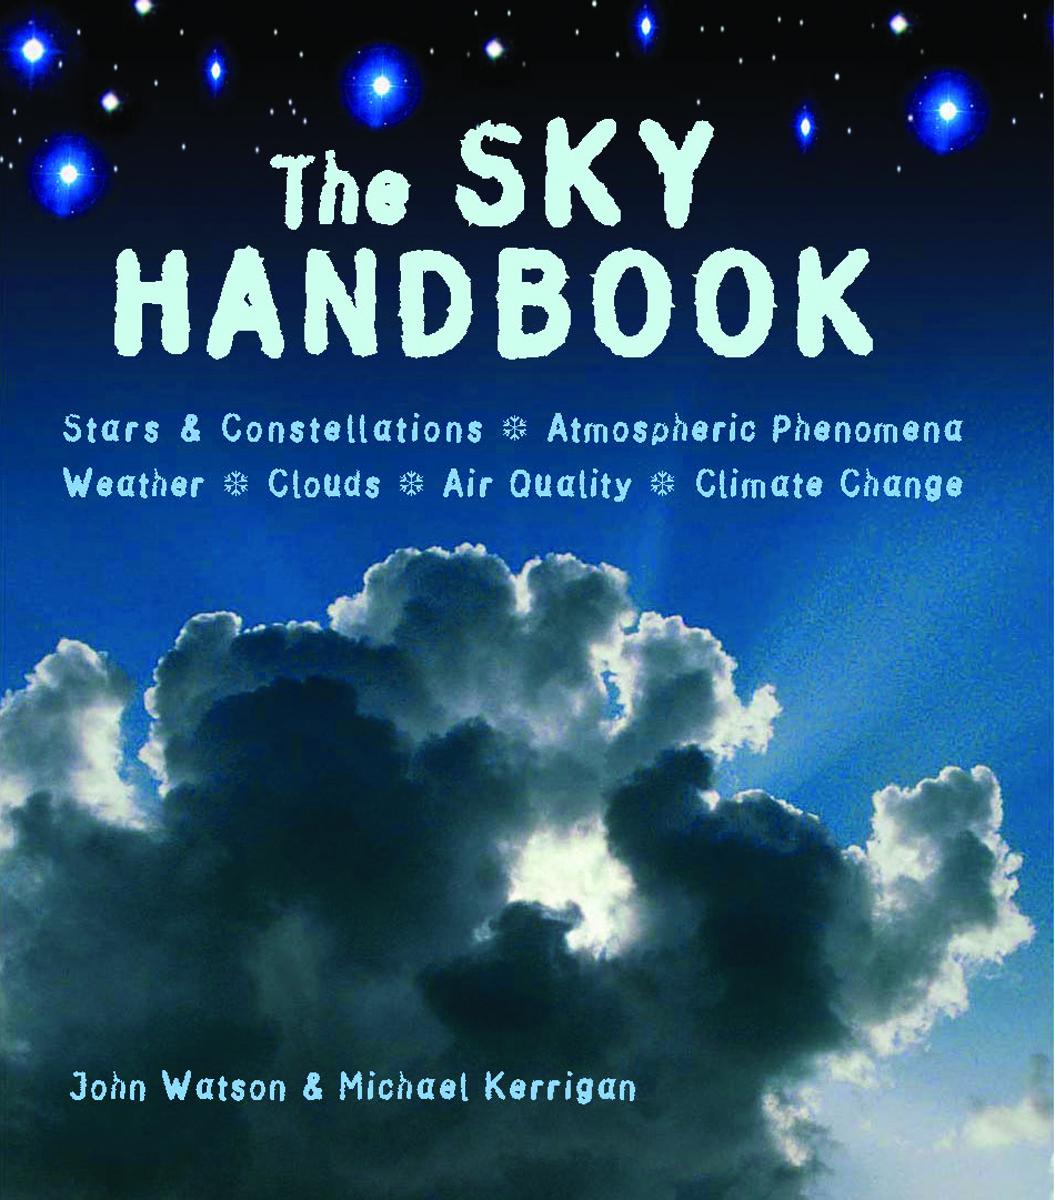 The Sky Handbook